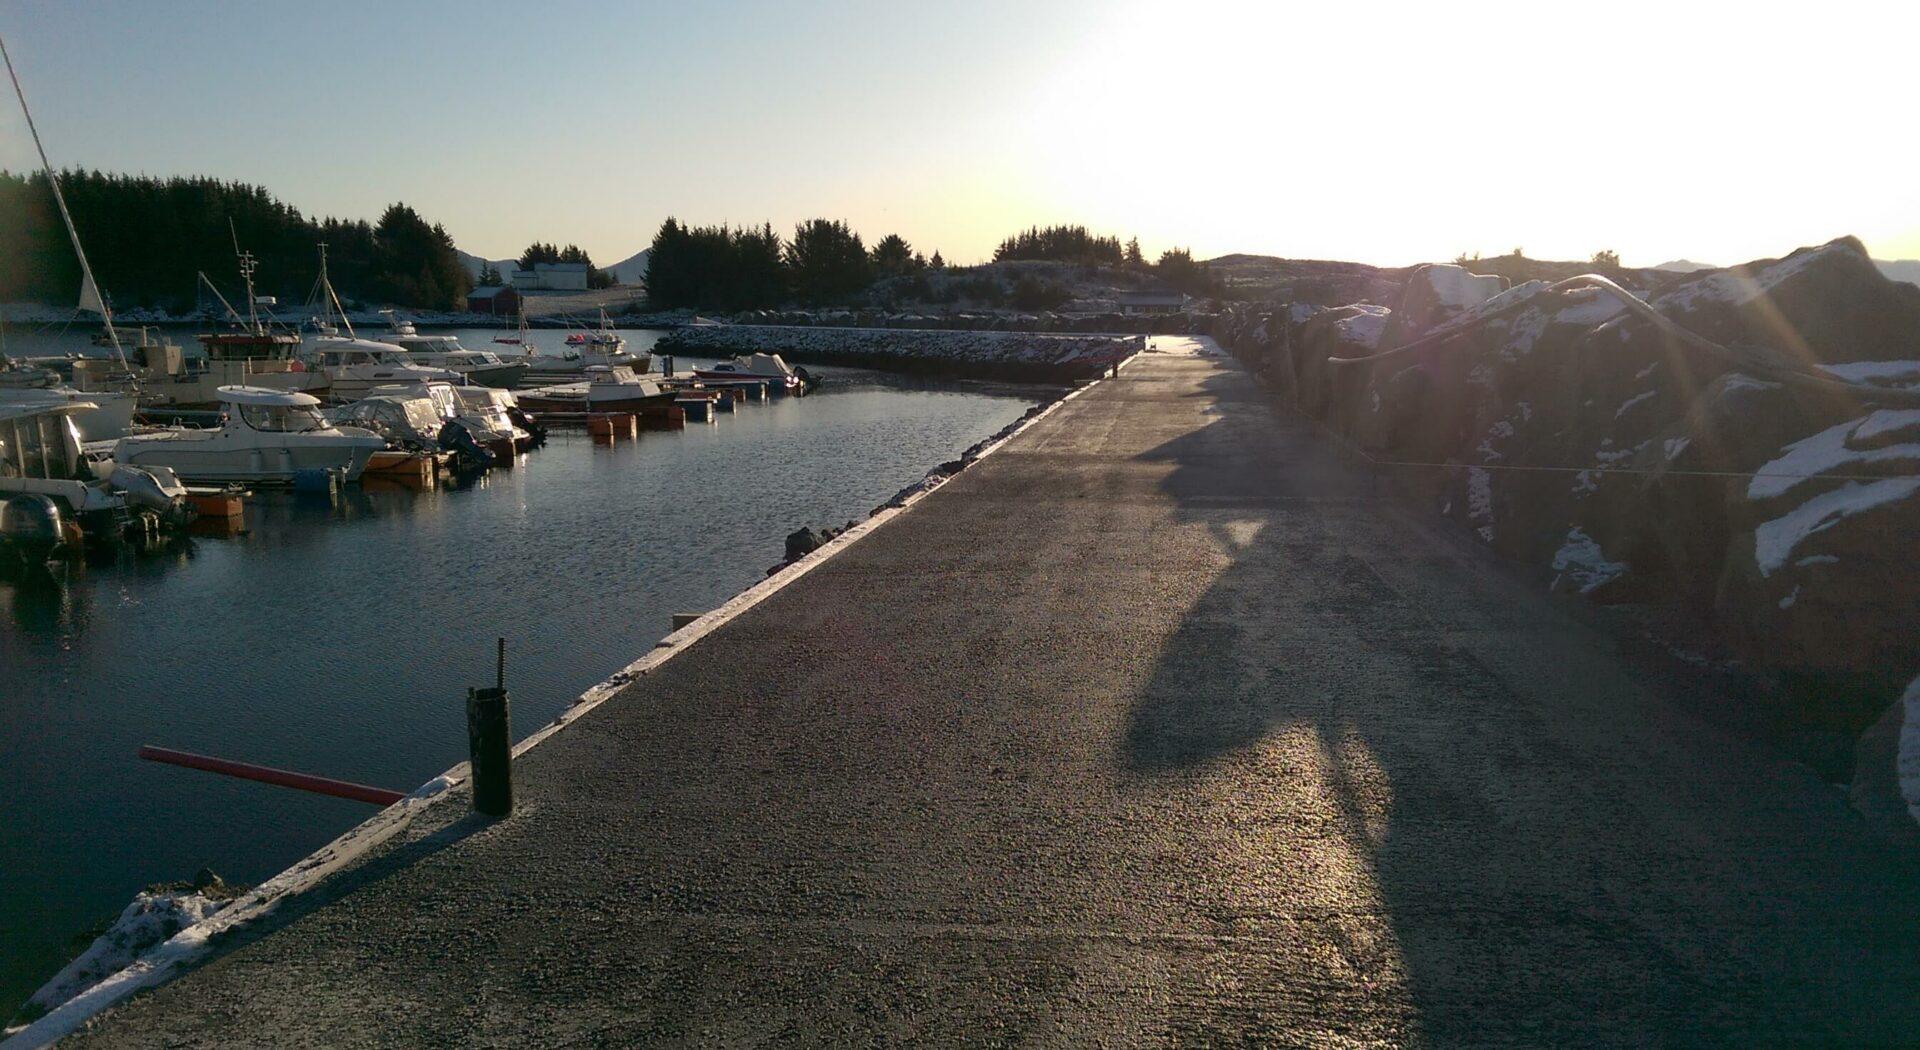 Bud båtforening_4